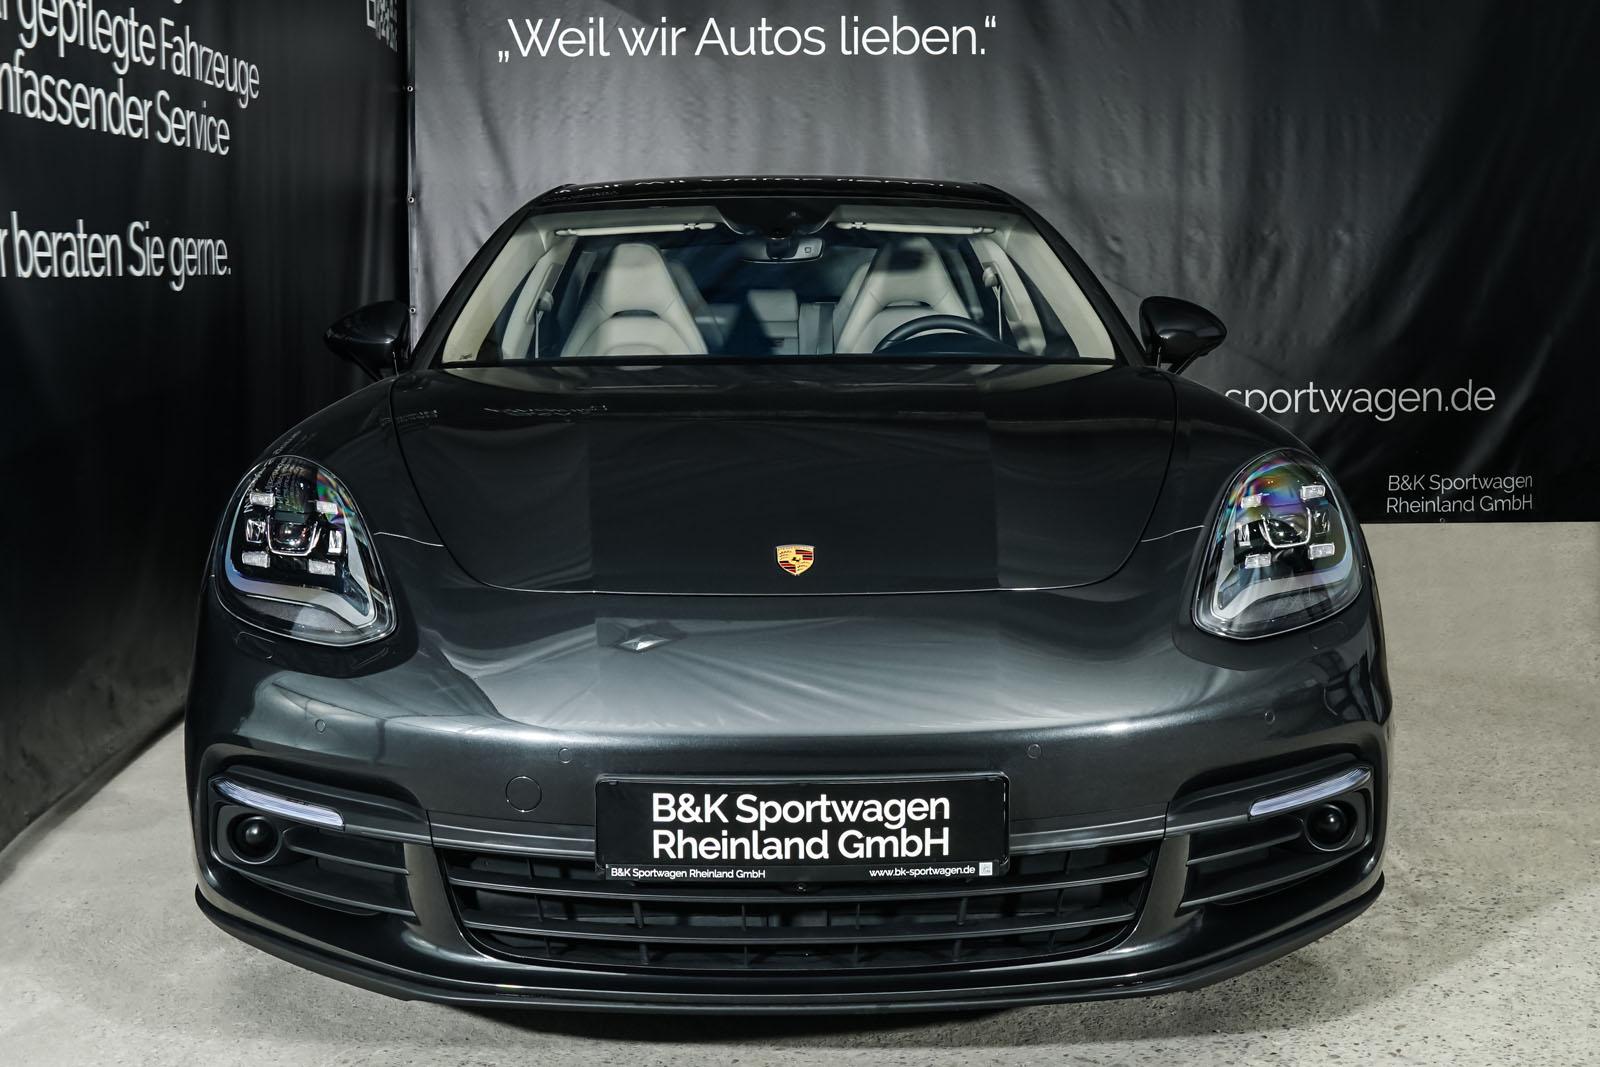 Porsche_Panamera4_SportTurismo_Grau_Weißgrau_POR-0979_1_w